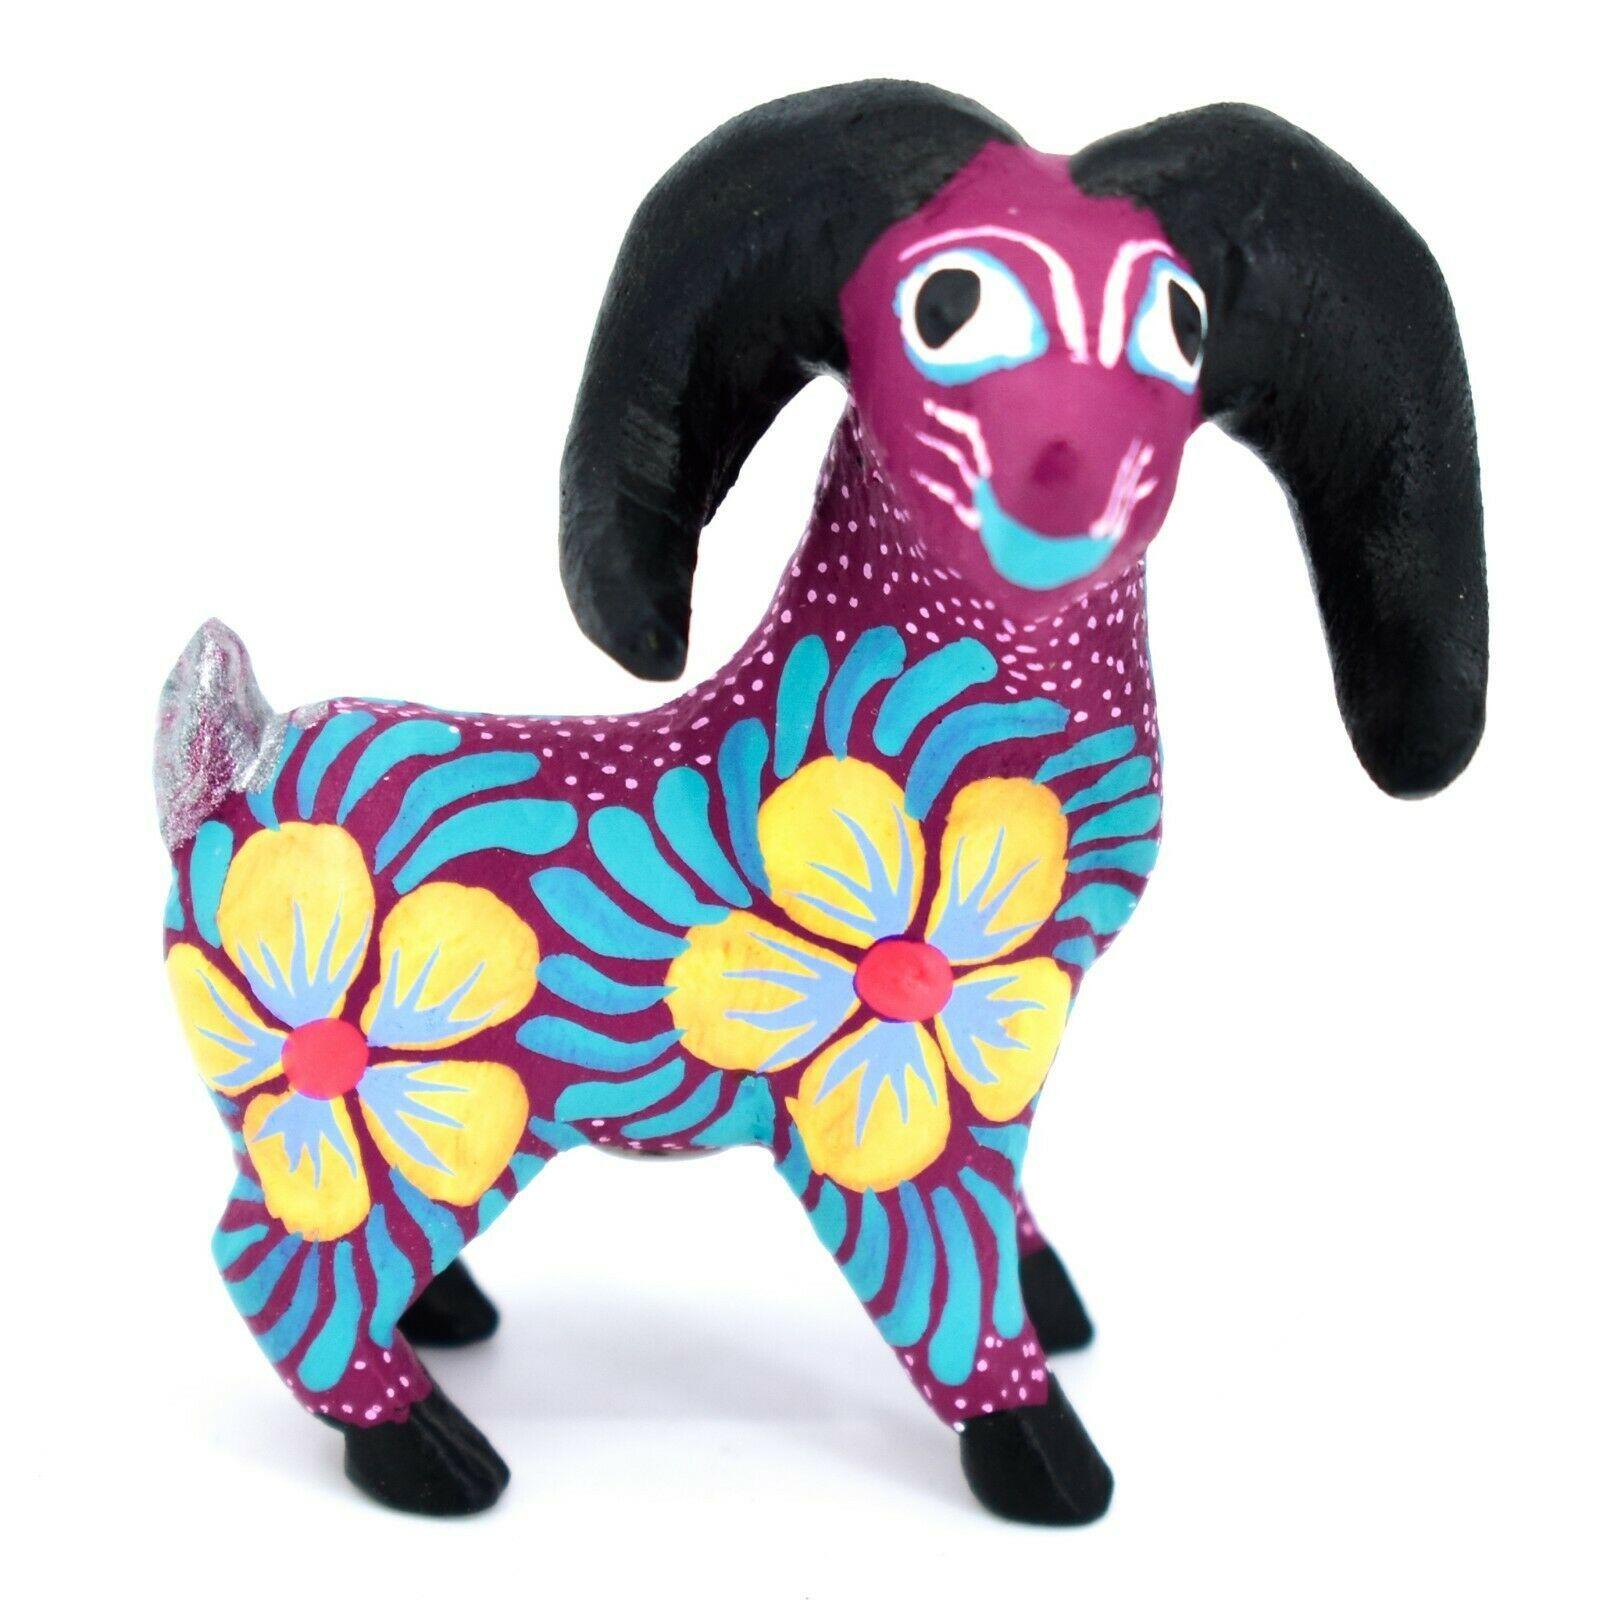 Handmade Alebrijes Oaxacan Copal Wood Painted Folk Art Big Horn Sheep Figurine